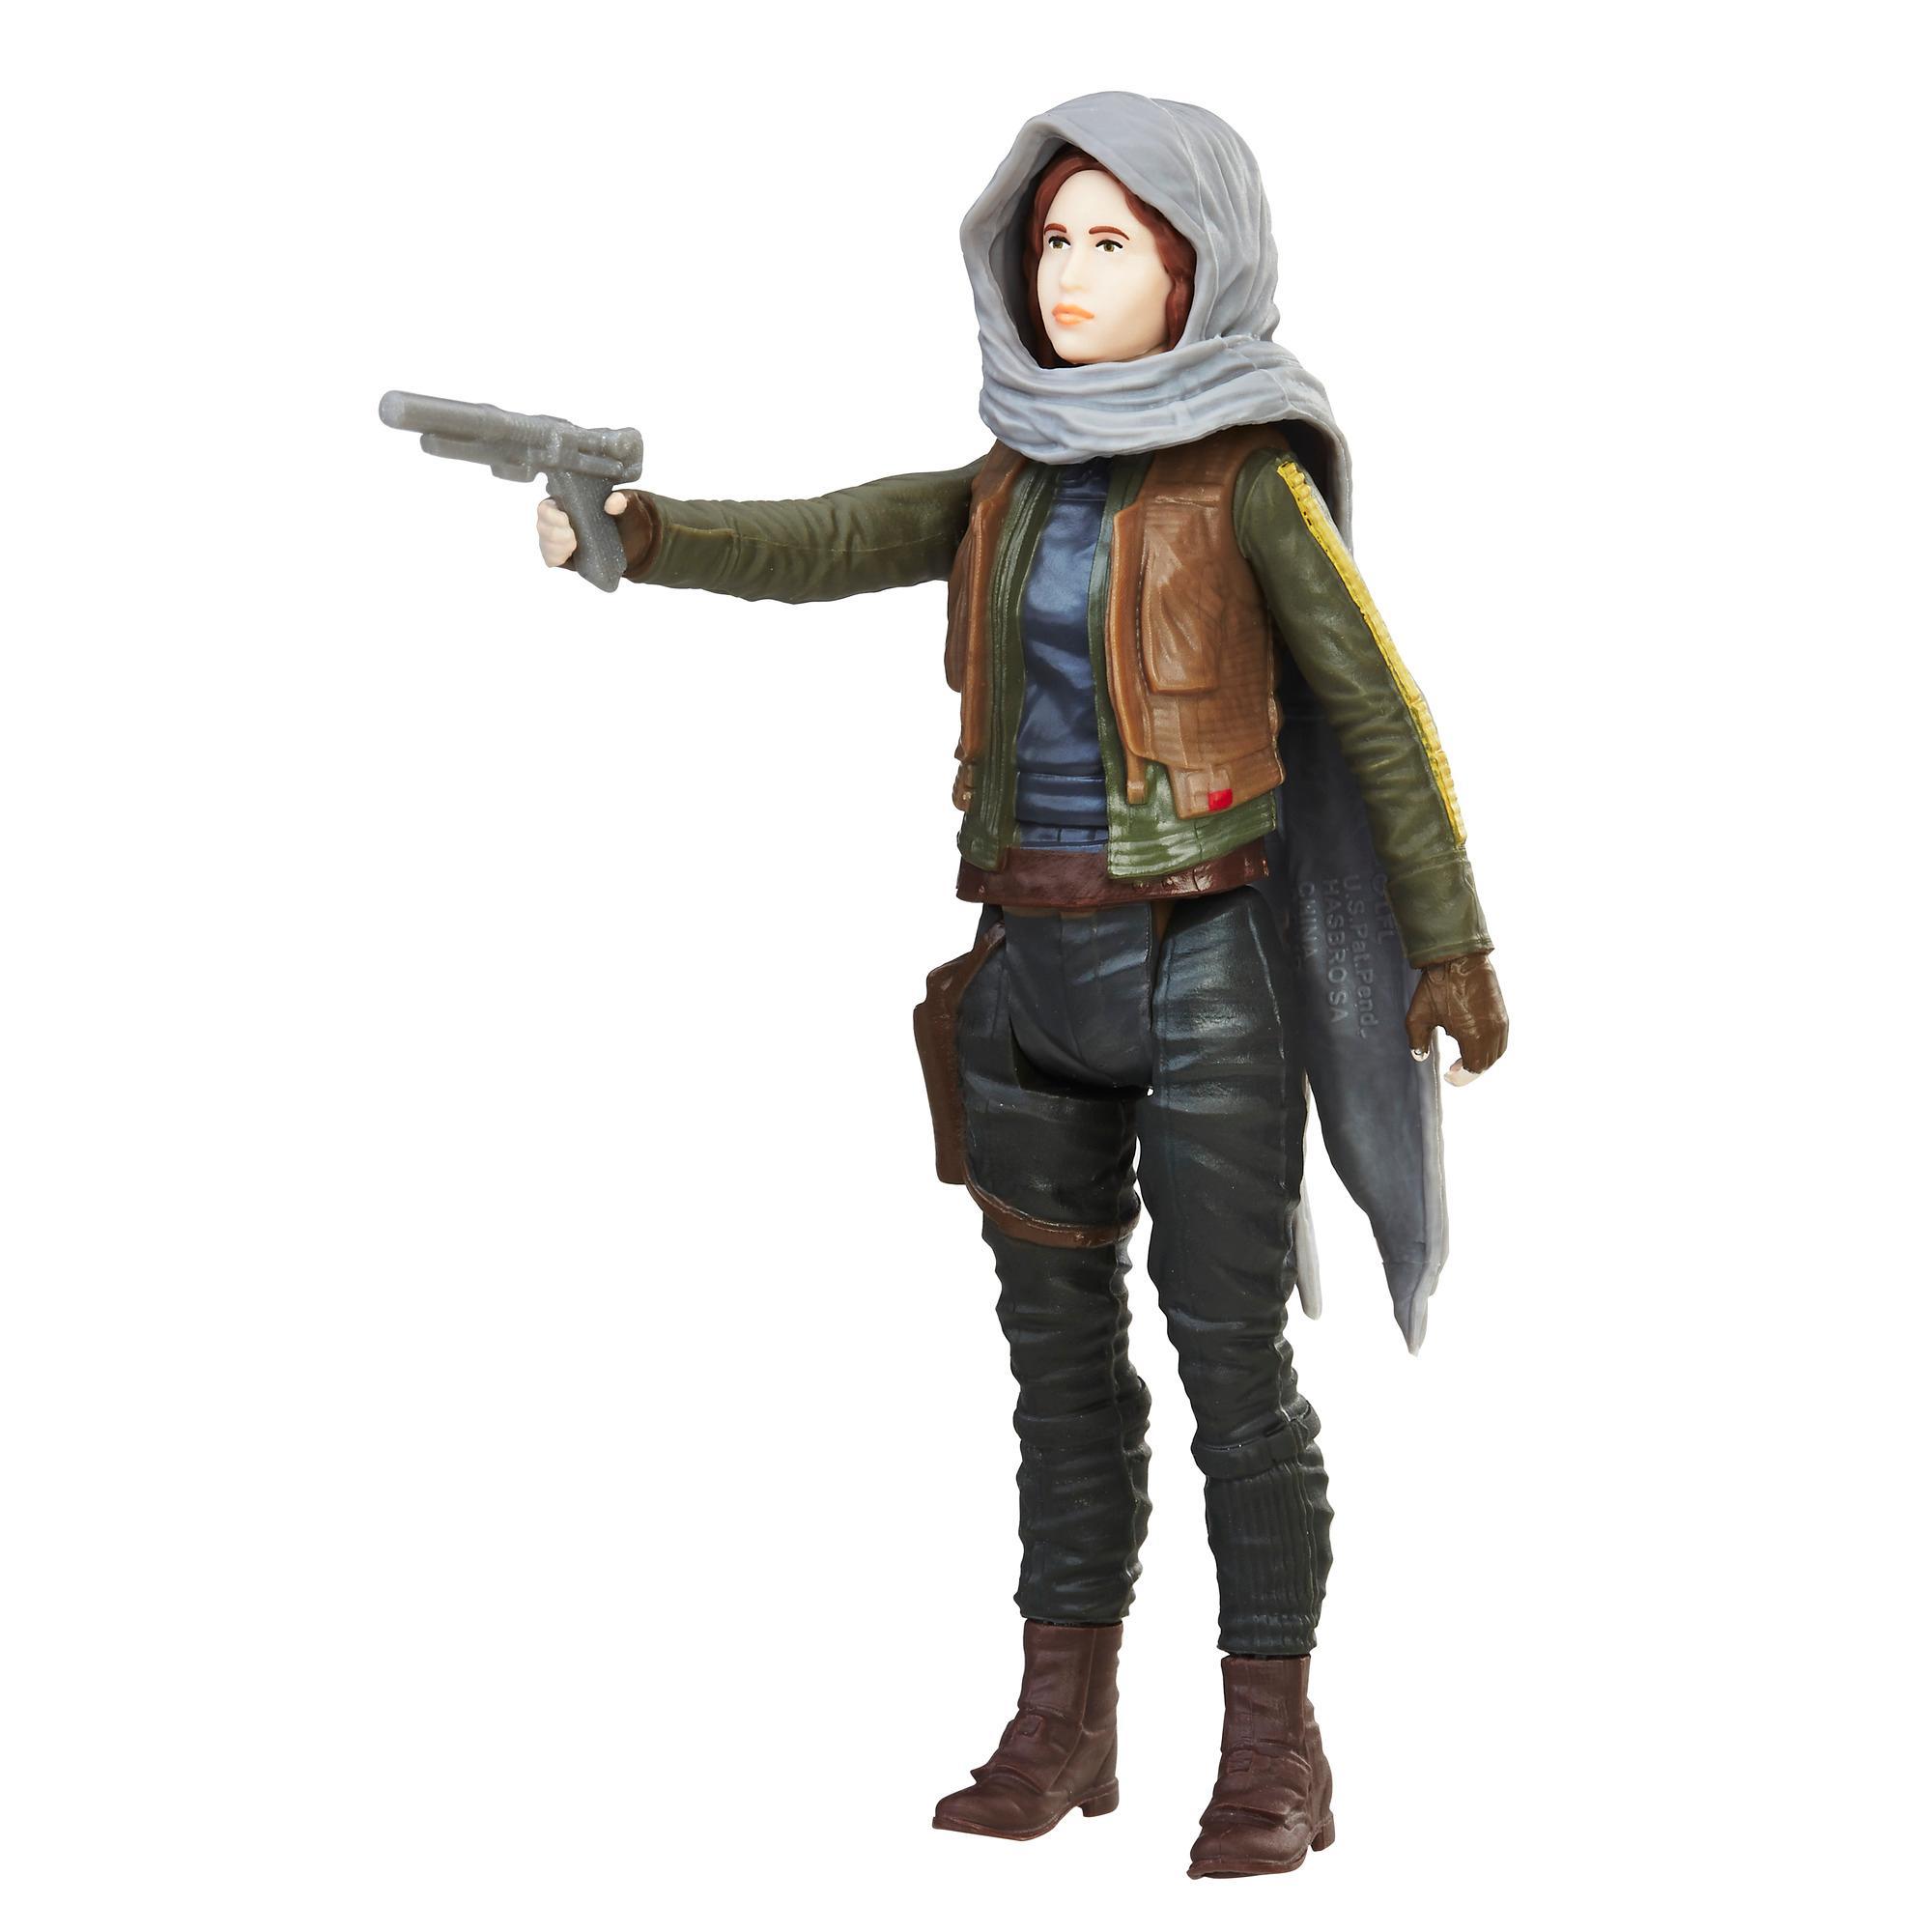 Star Wars Jyn Erso (Jedha) Force Link Figure